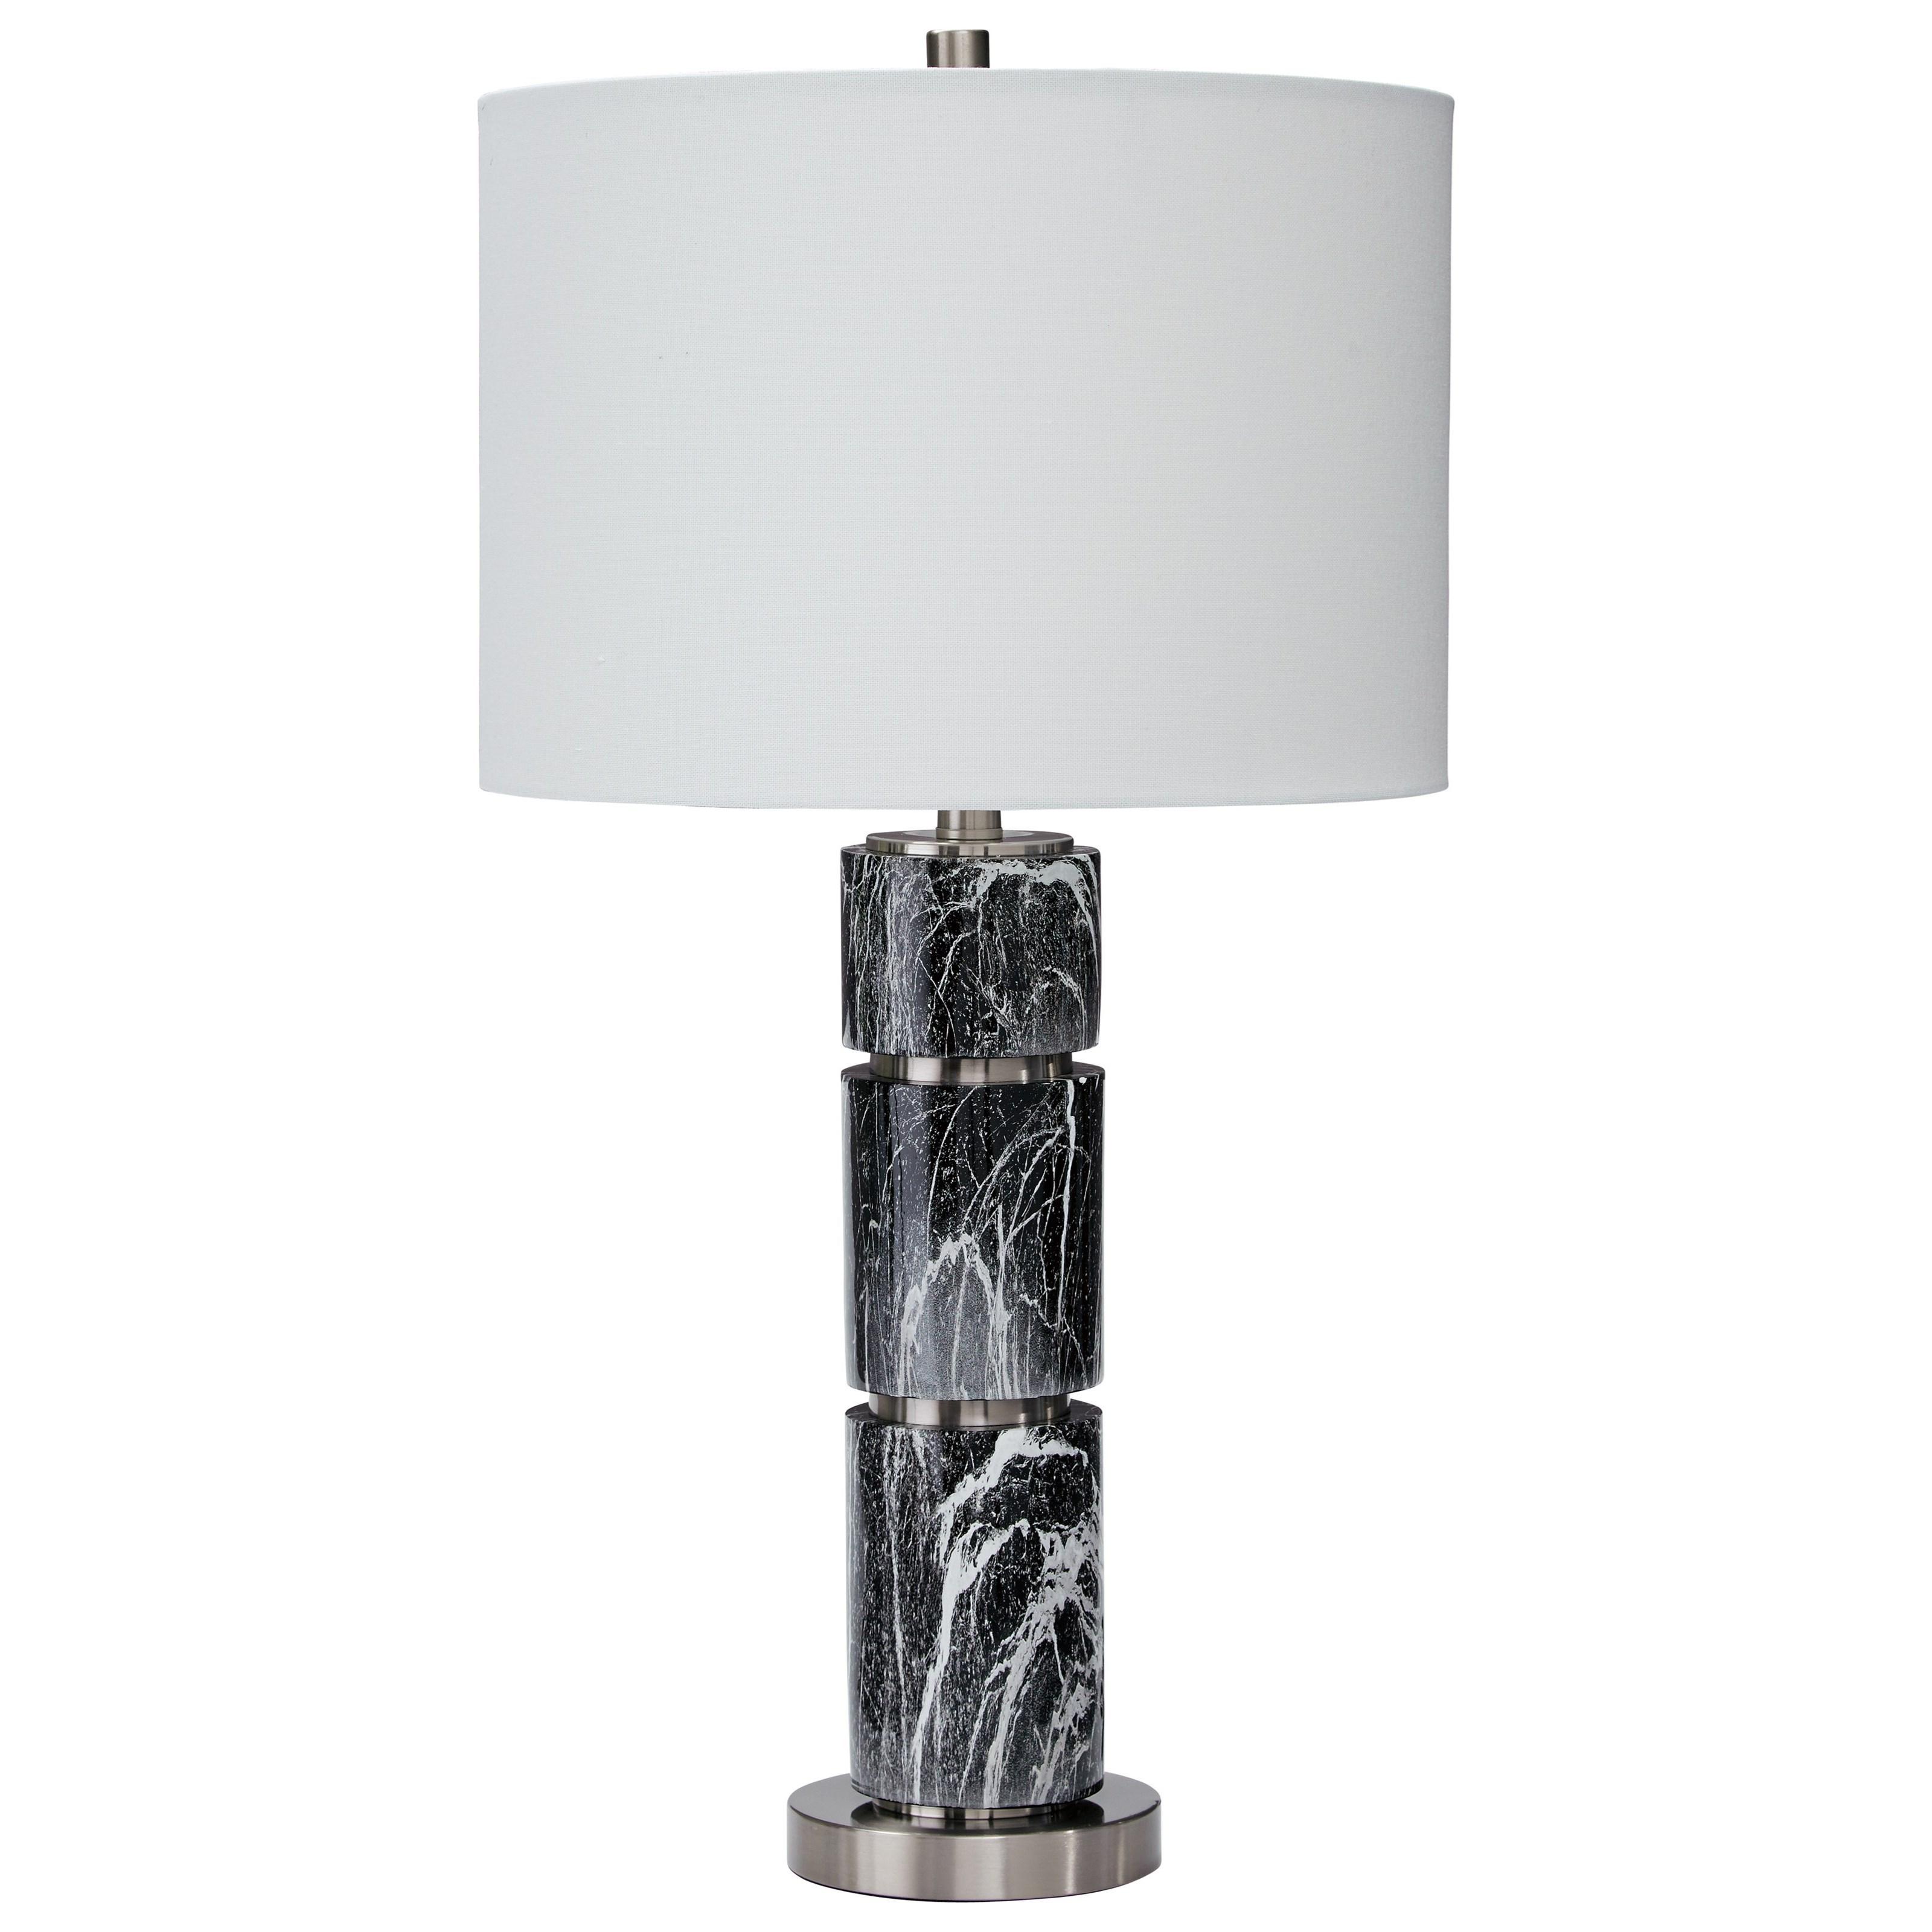 Set of 2 Maricela Black/White Table Lamps